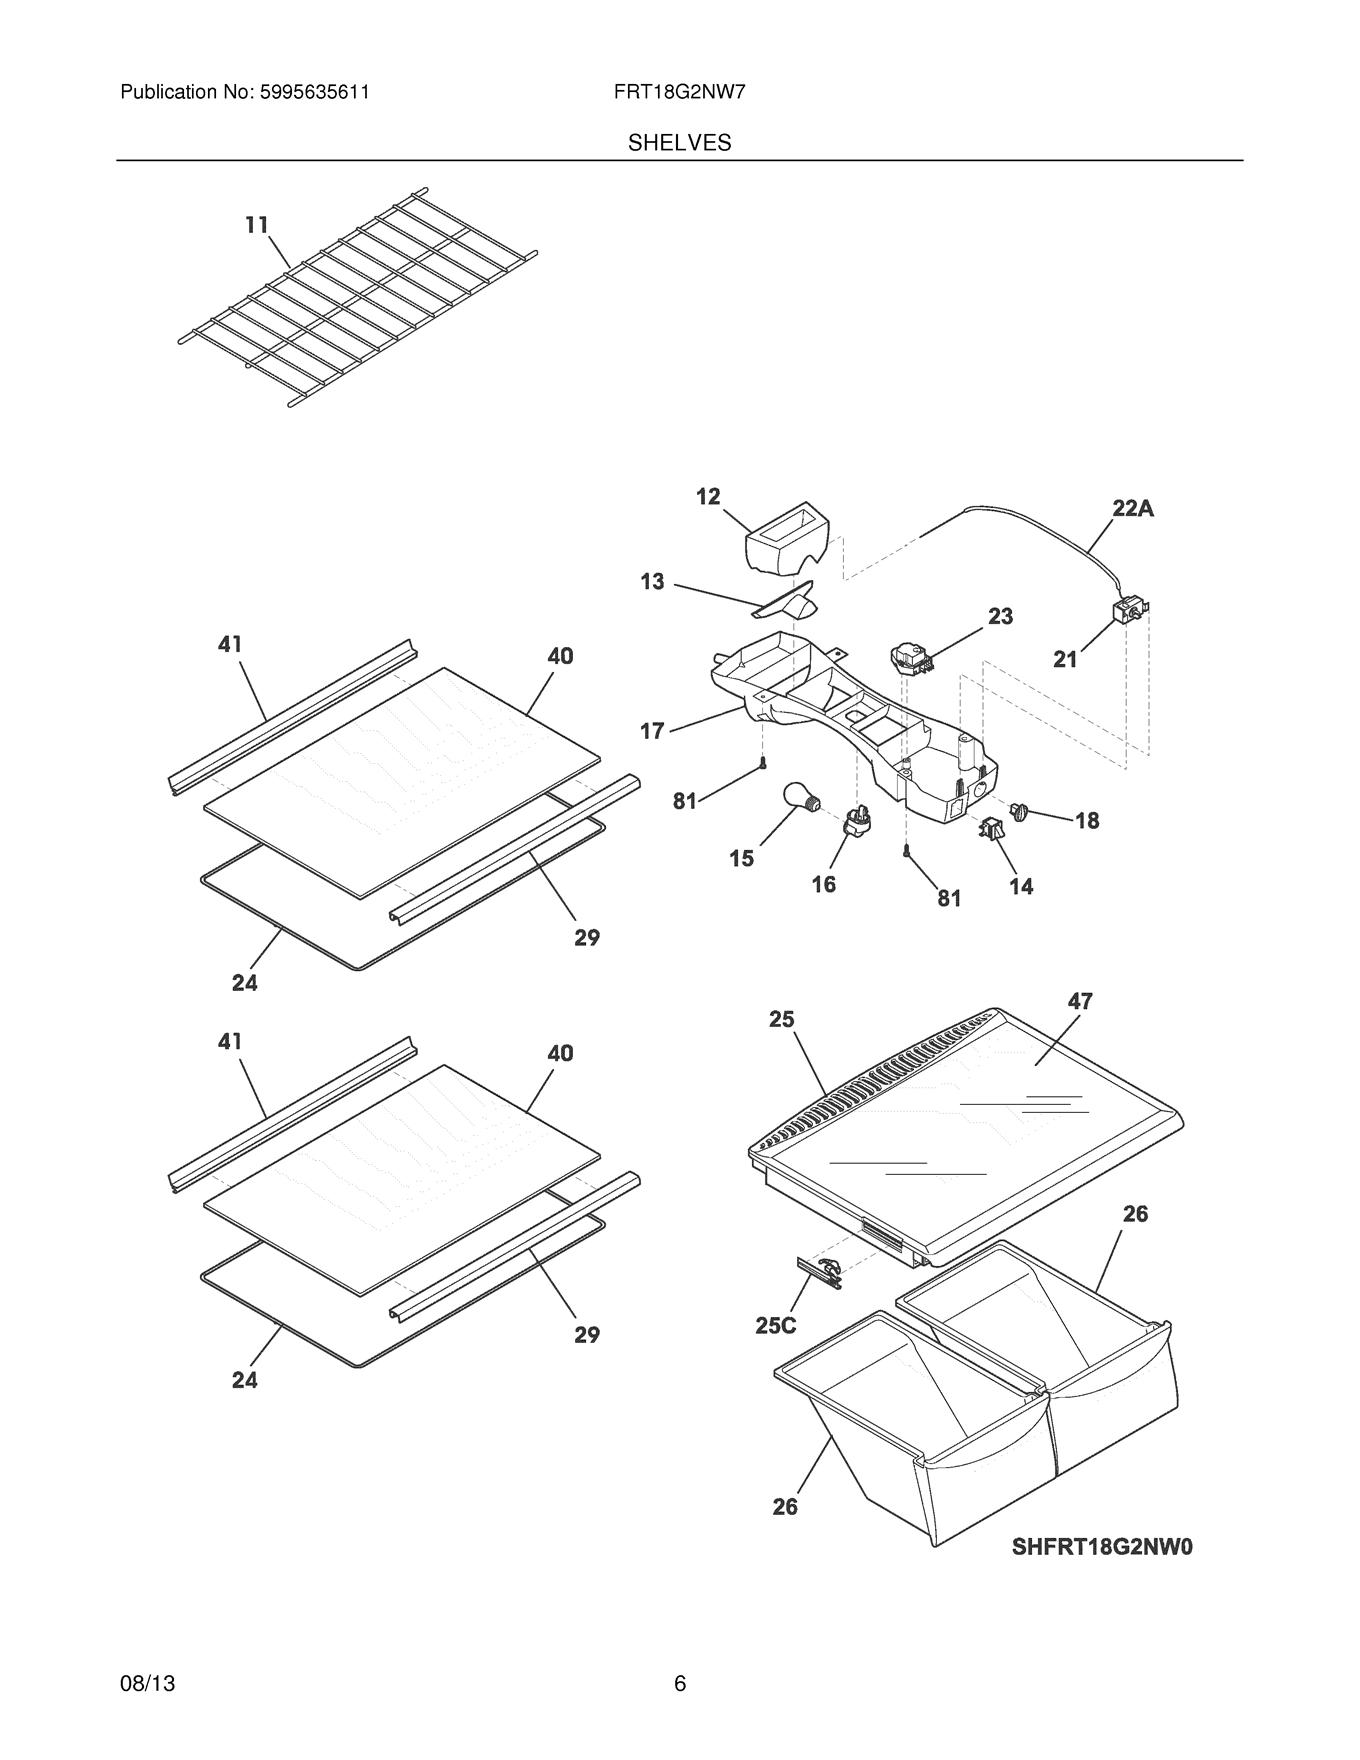 Frigidaire Frt18g2nw7 Control Box Wiring Harness Genuine Oem